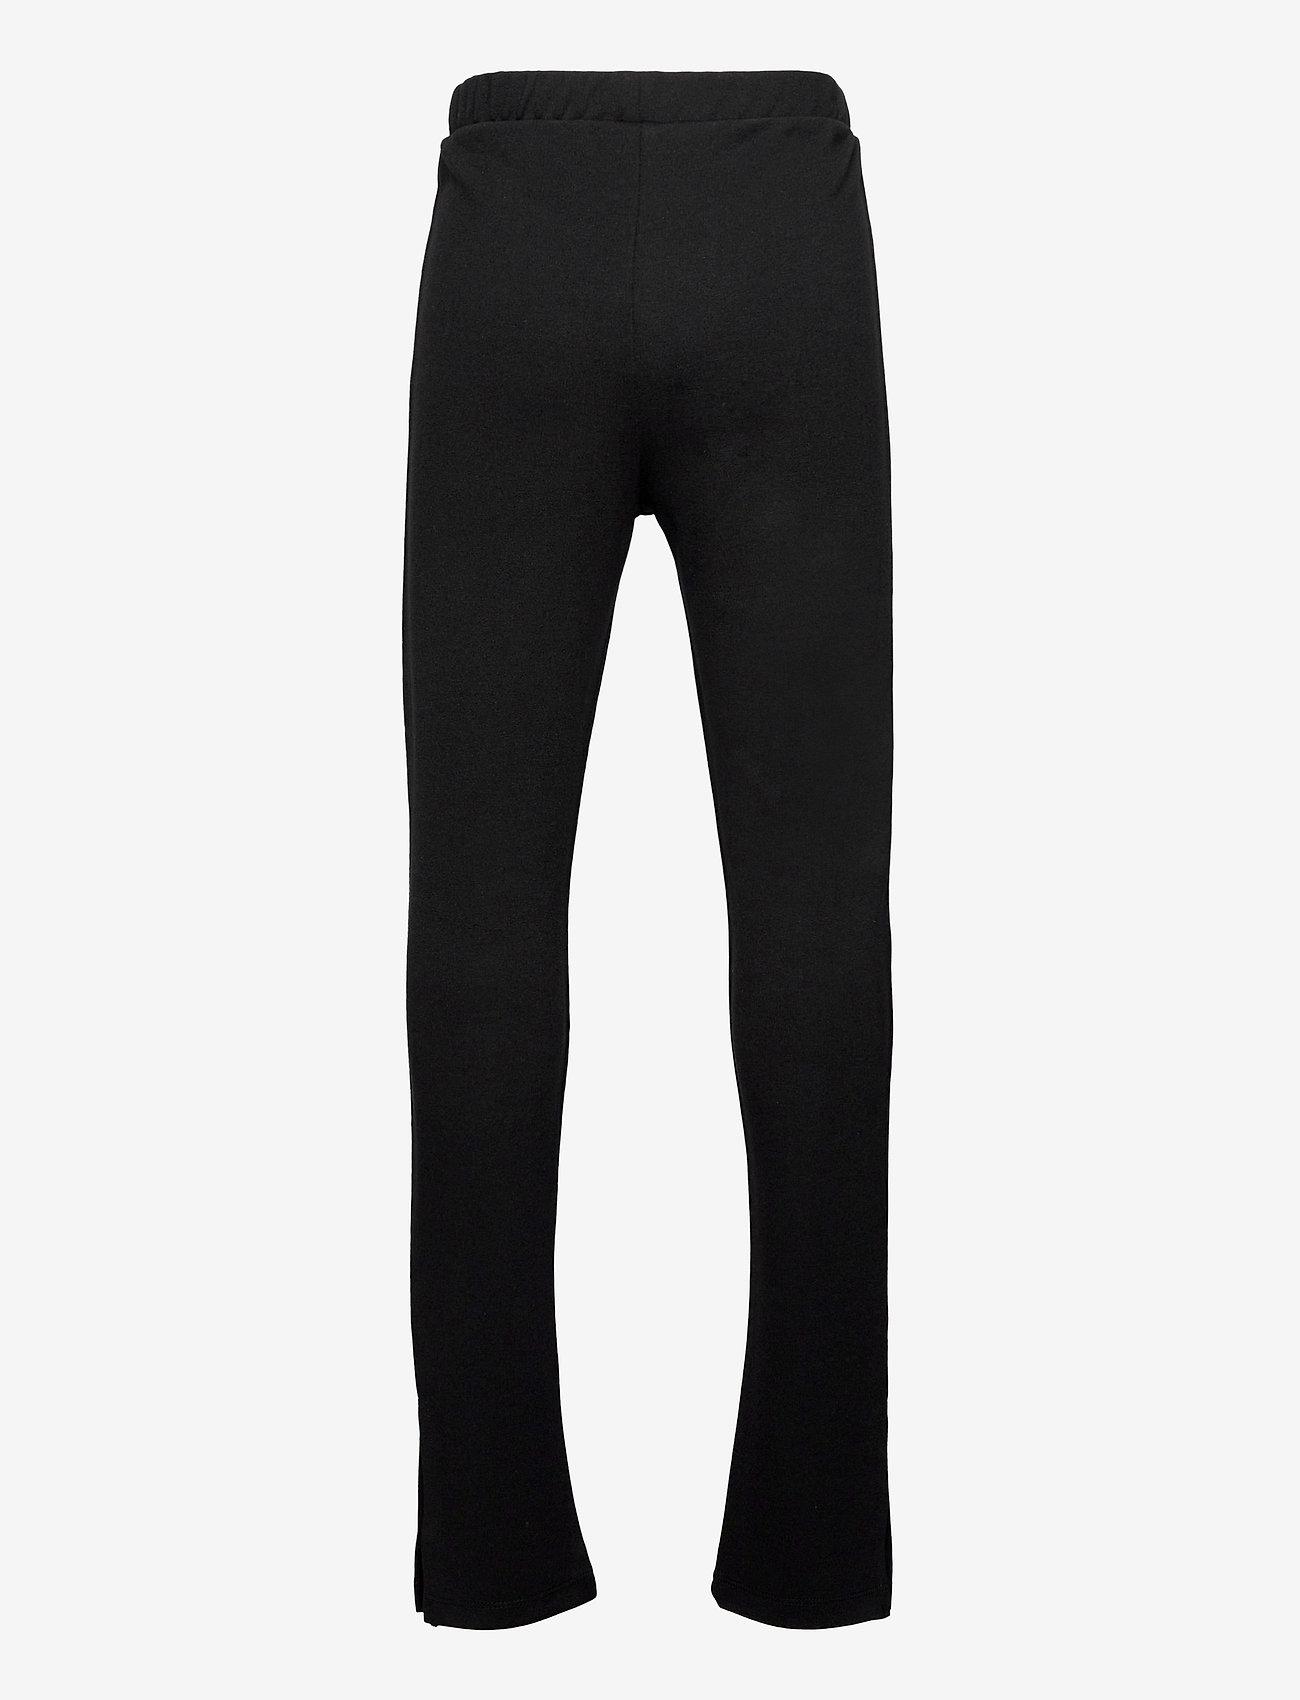 LMTD - NLFDONNA SLIT PANT - jogginghosen - black - 1